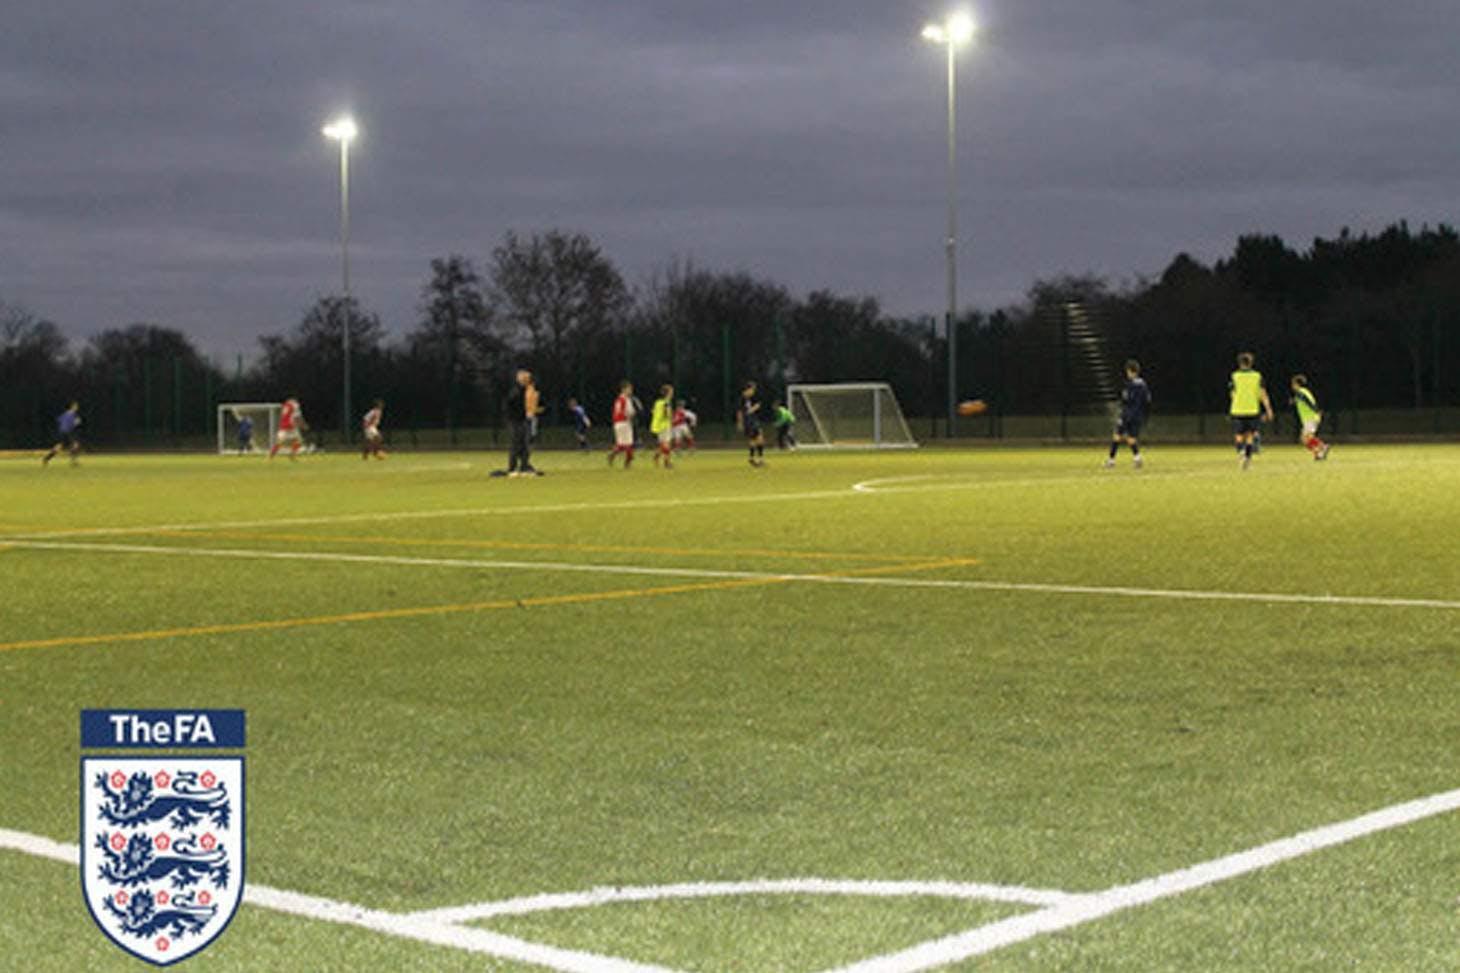 Bishop Rawstorne CE Academy 9 a side | 3G Astroturf football pitch